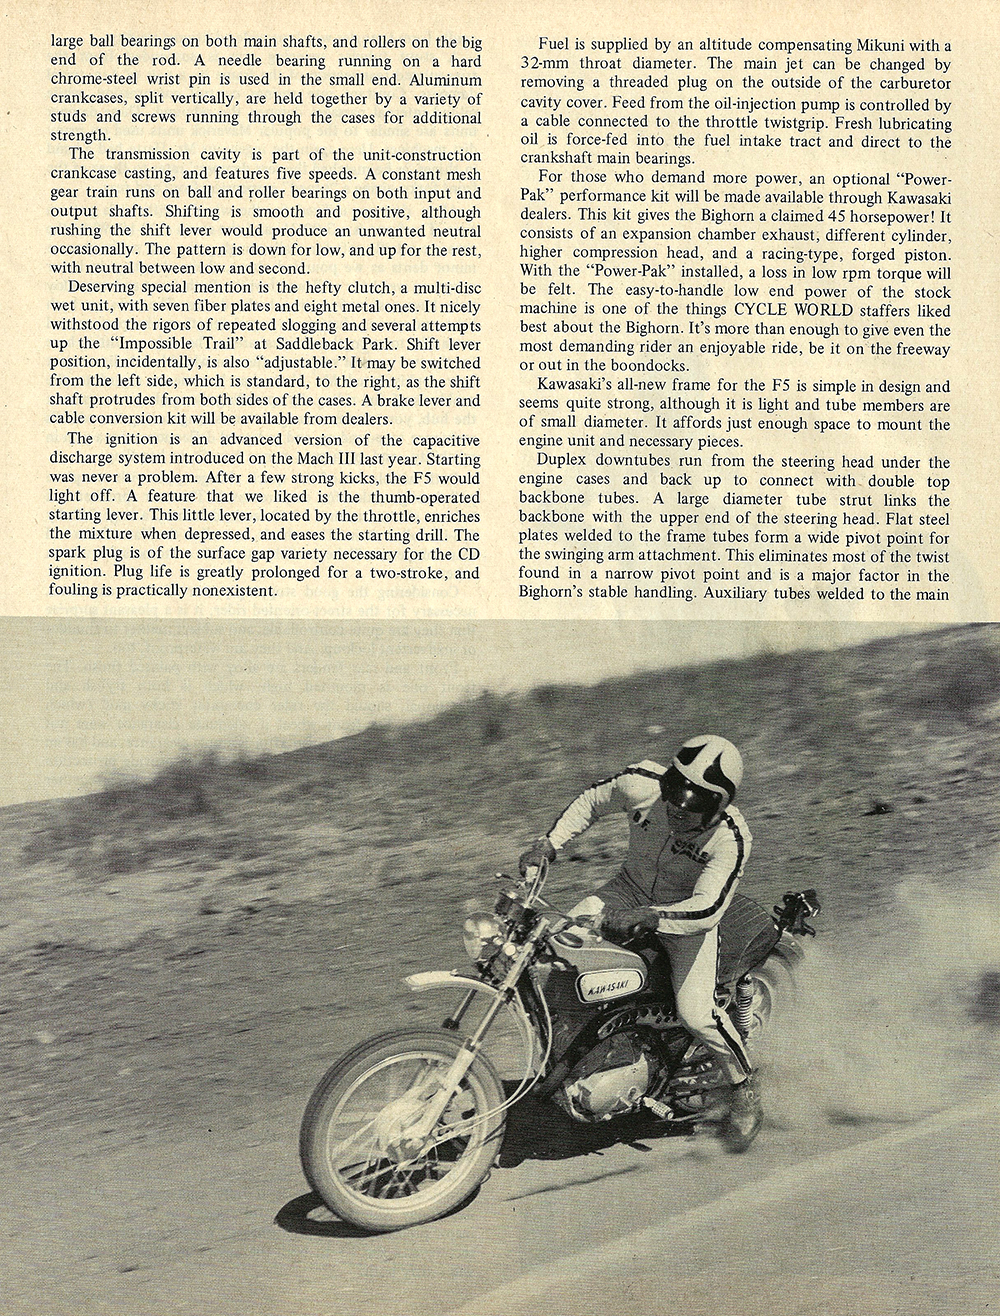 1970 Kawasaki F5 Bighorn road test 04.jpg